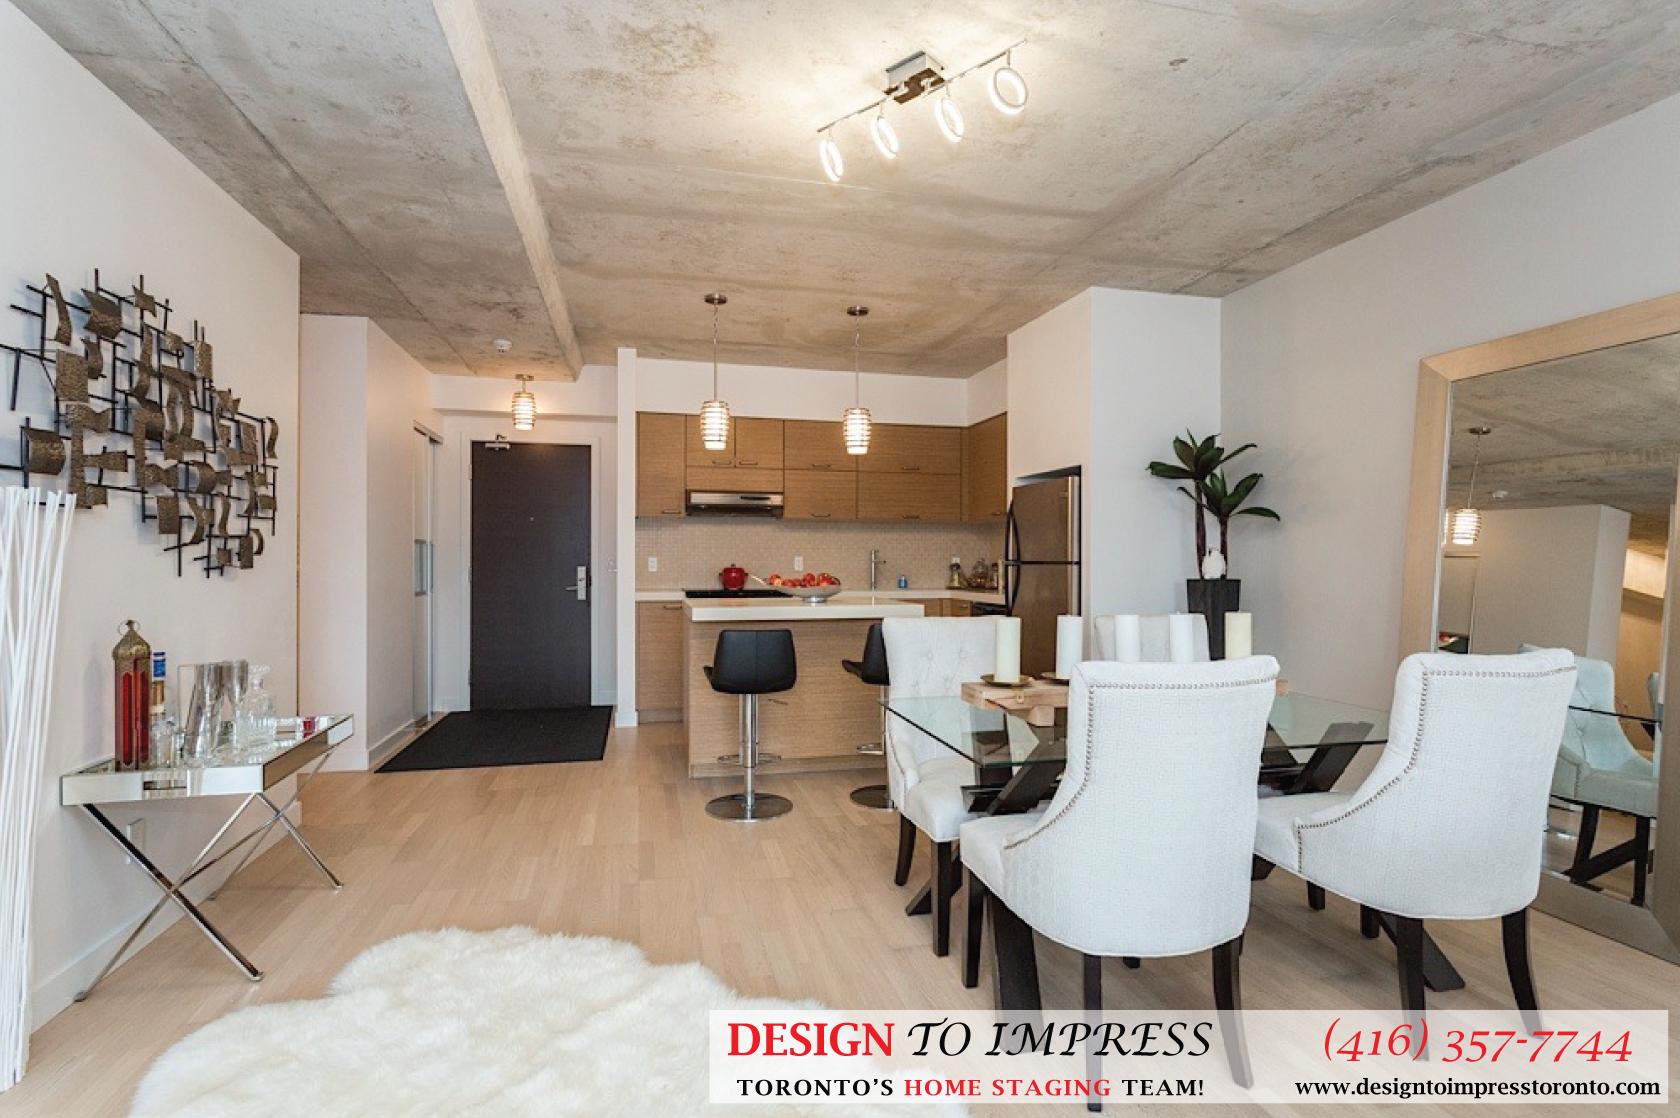 Living Room Hallway, 55 Stewart, Toronto Condo Staging